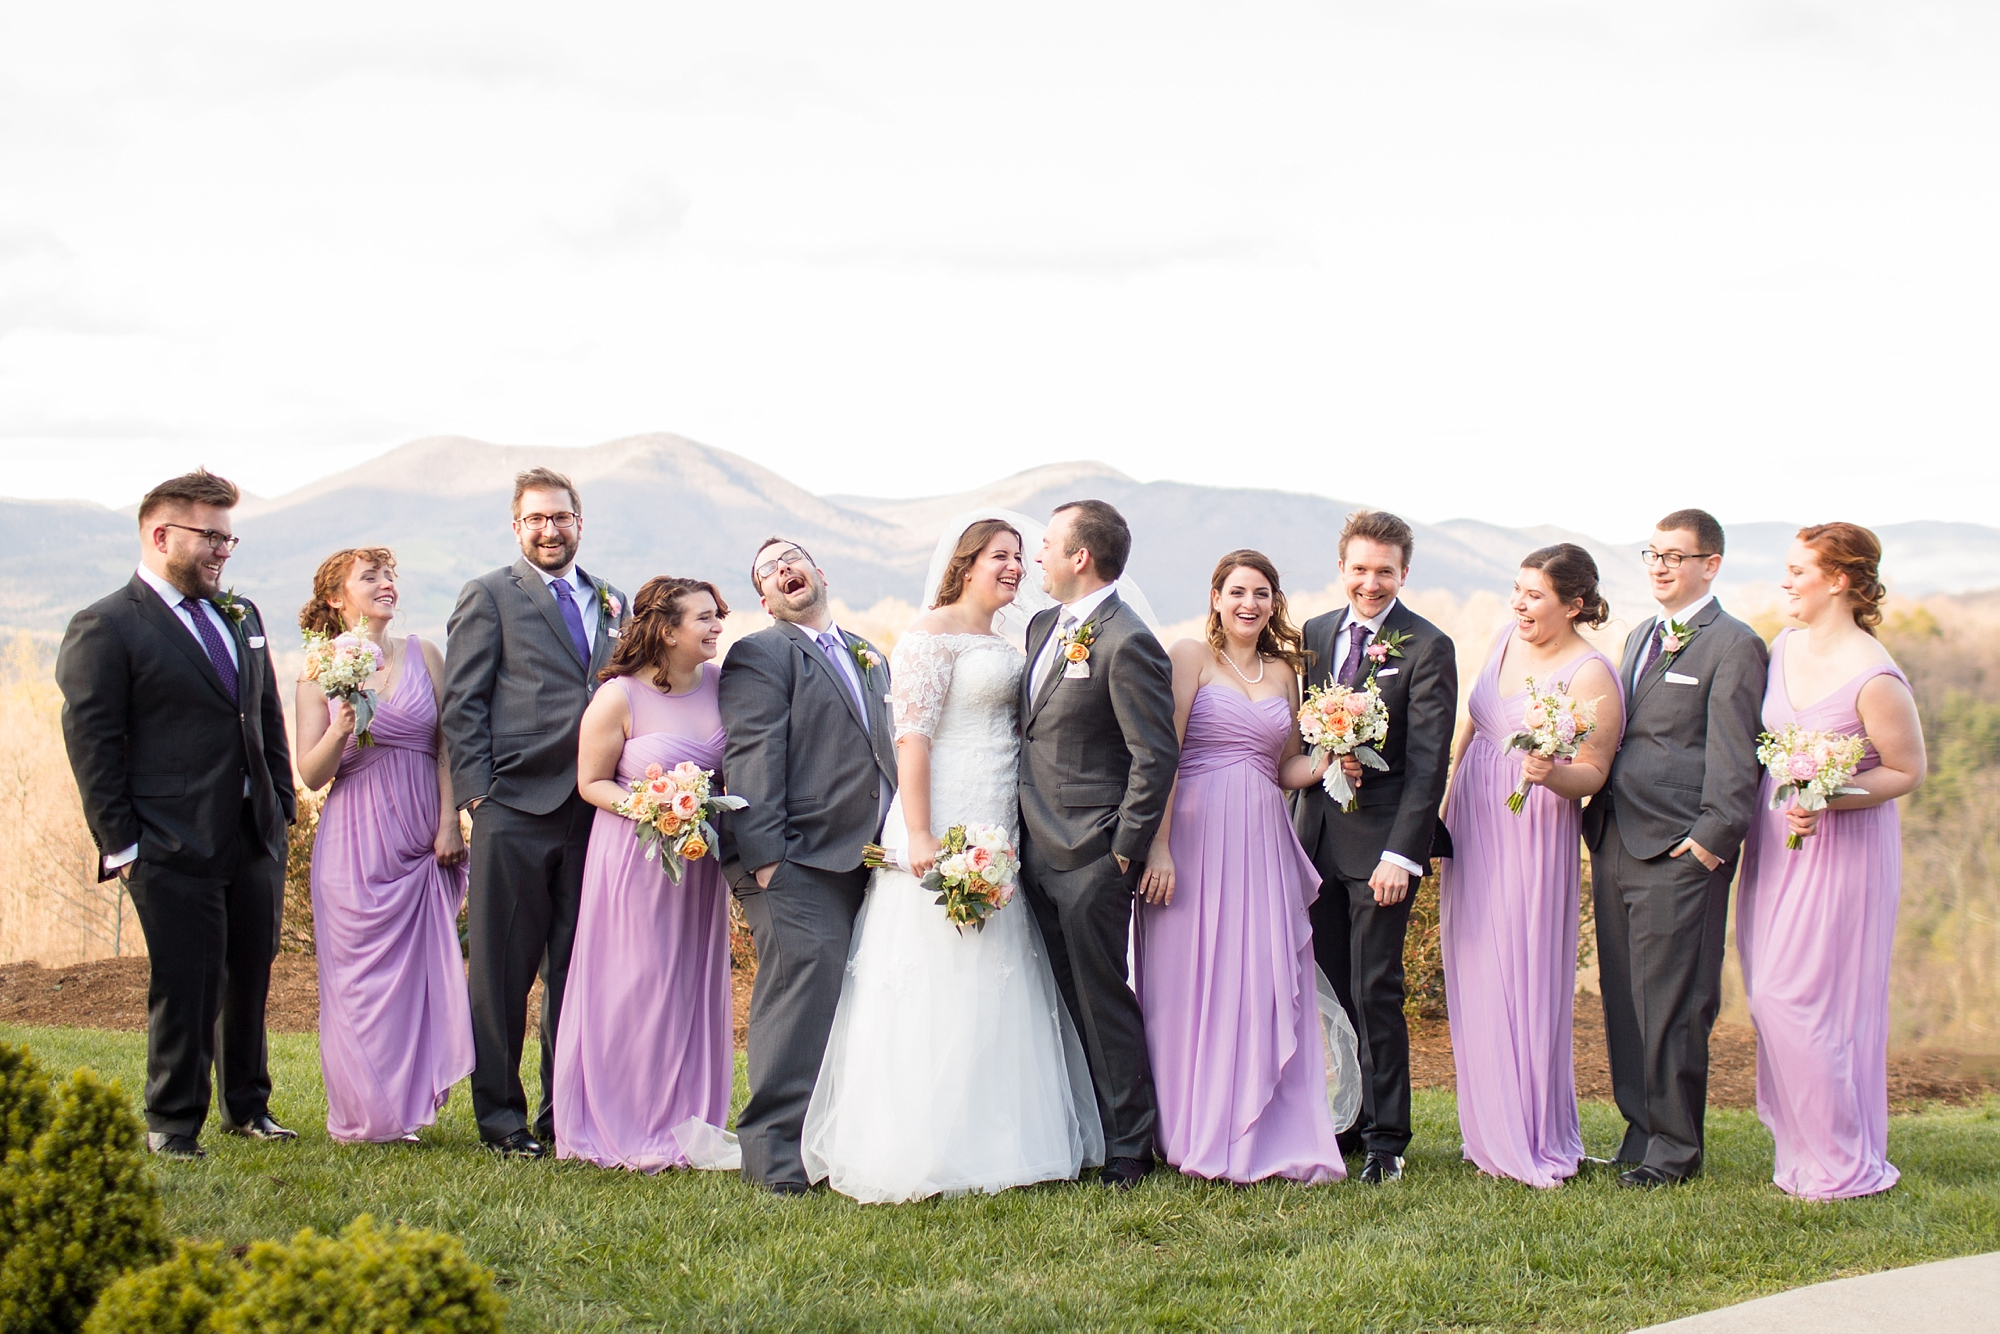 Simpson 2-Bridal Party-714_anna grace photography virginia wedding photographer irvine estate photo.jpg